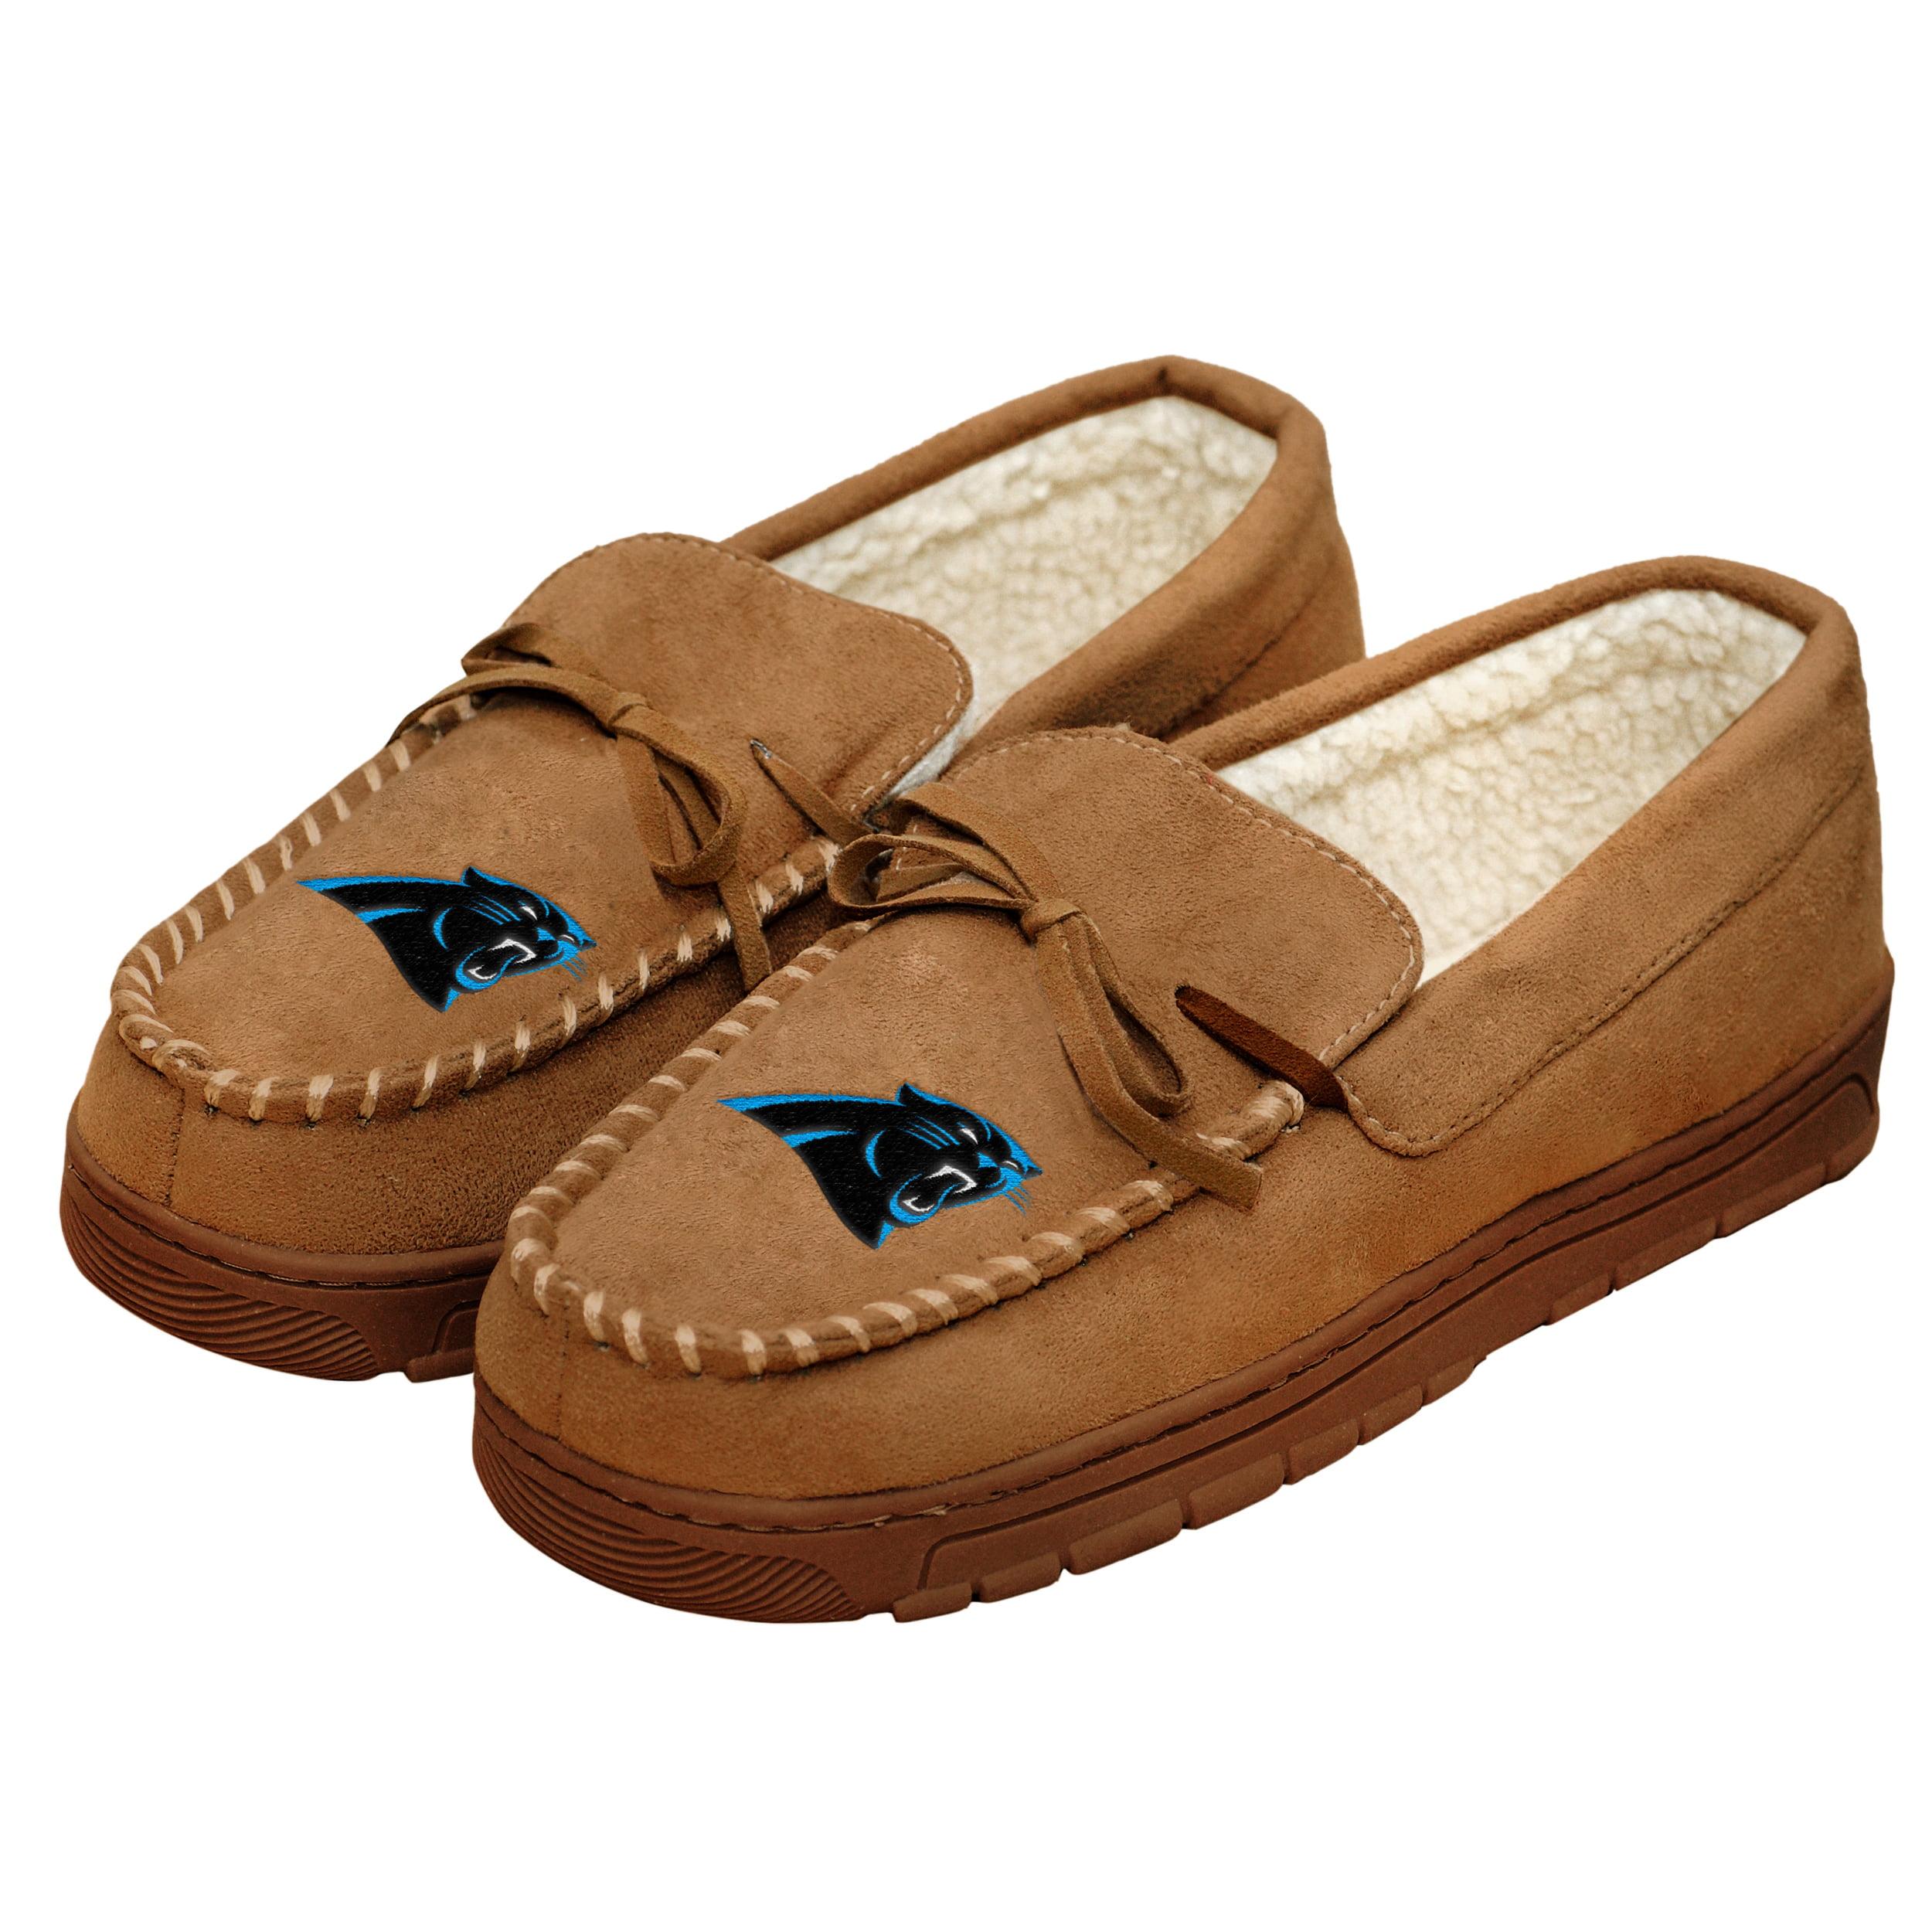 Carolina Panthers Men's Moccasin Slippers